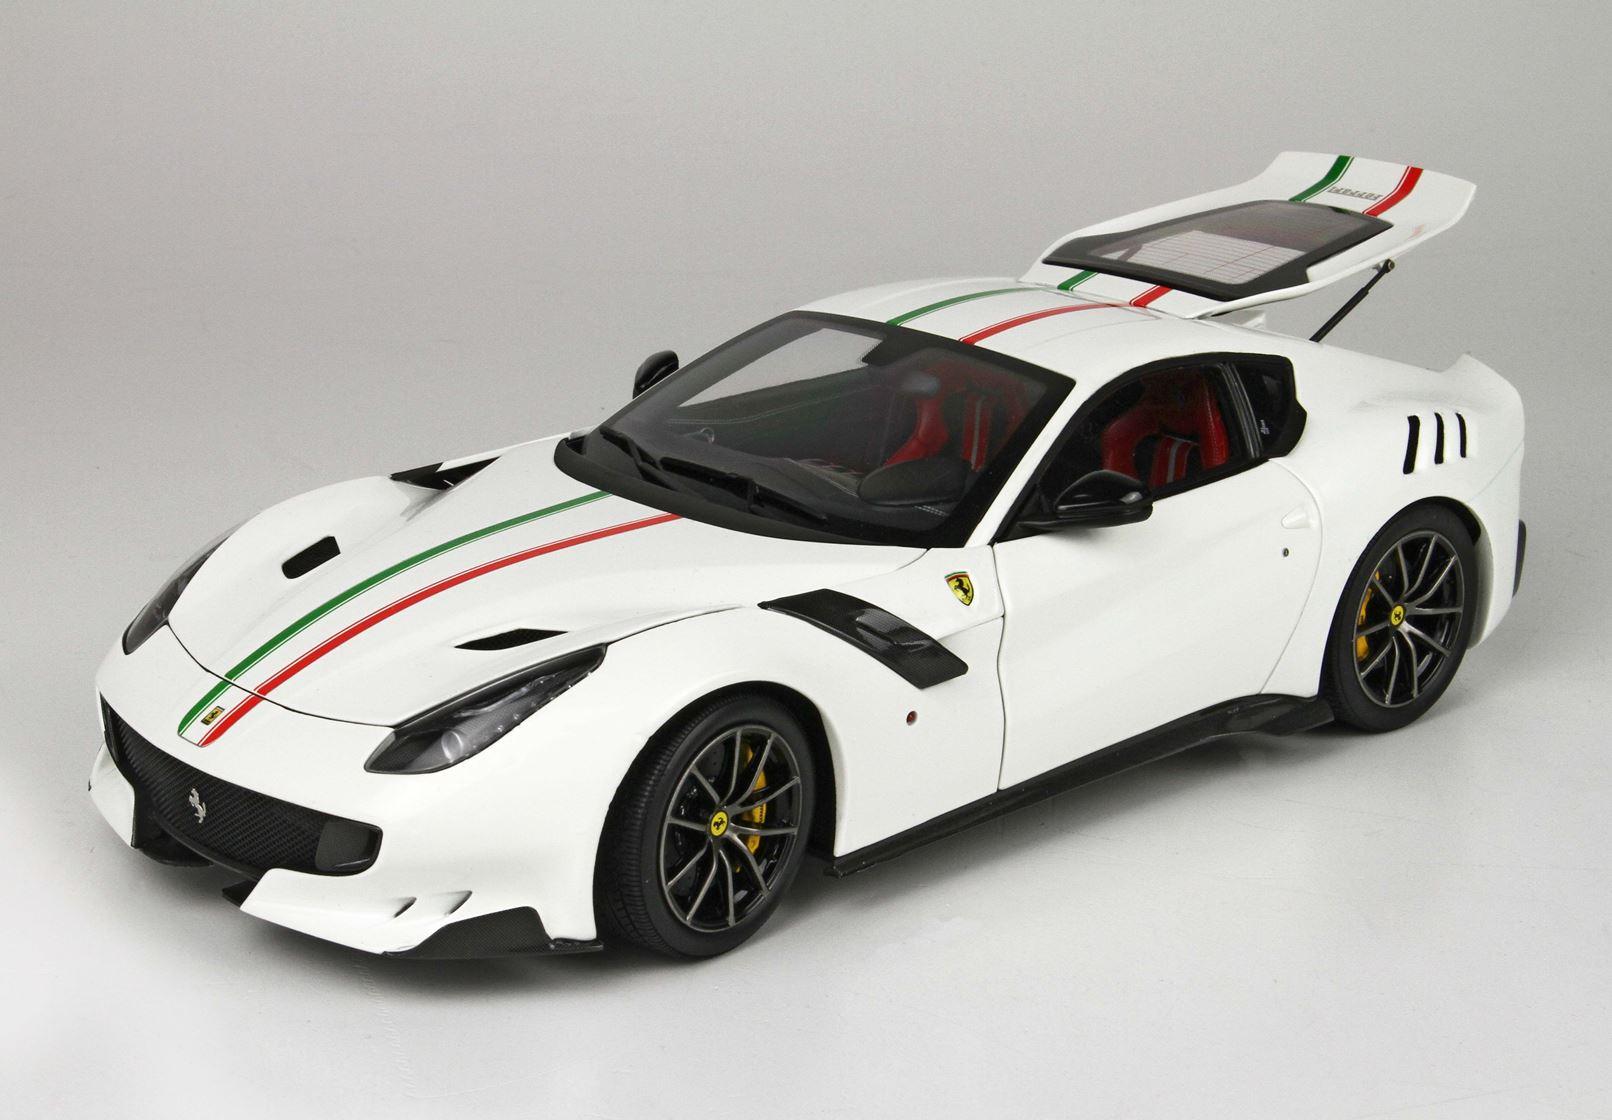 Bbr High End Ferrari F12 Tdf 2016 White Tricolore Hansecars Modelcars Hansecars Exklusive Sammlermodelle